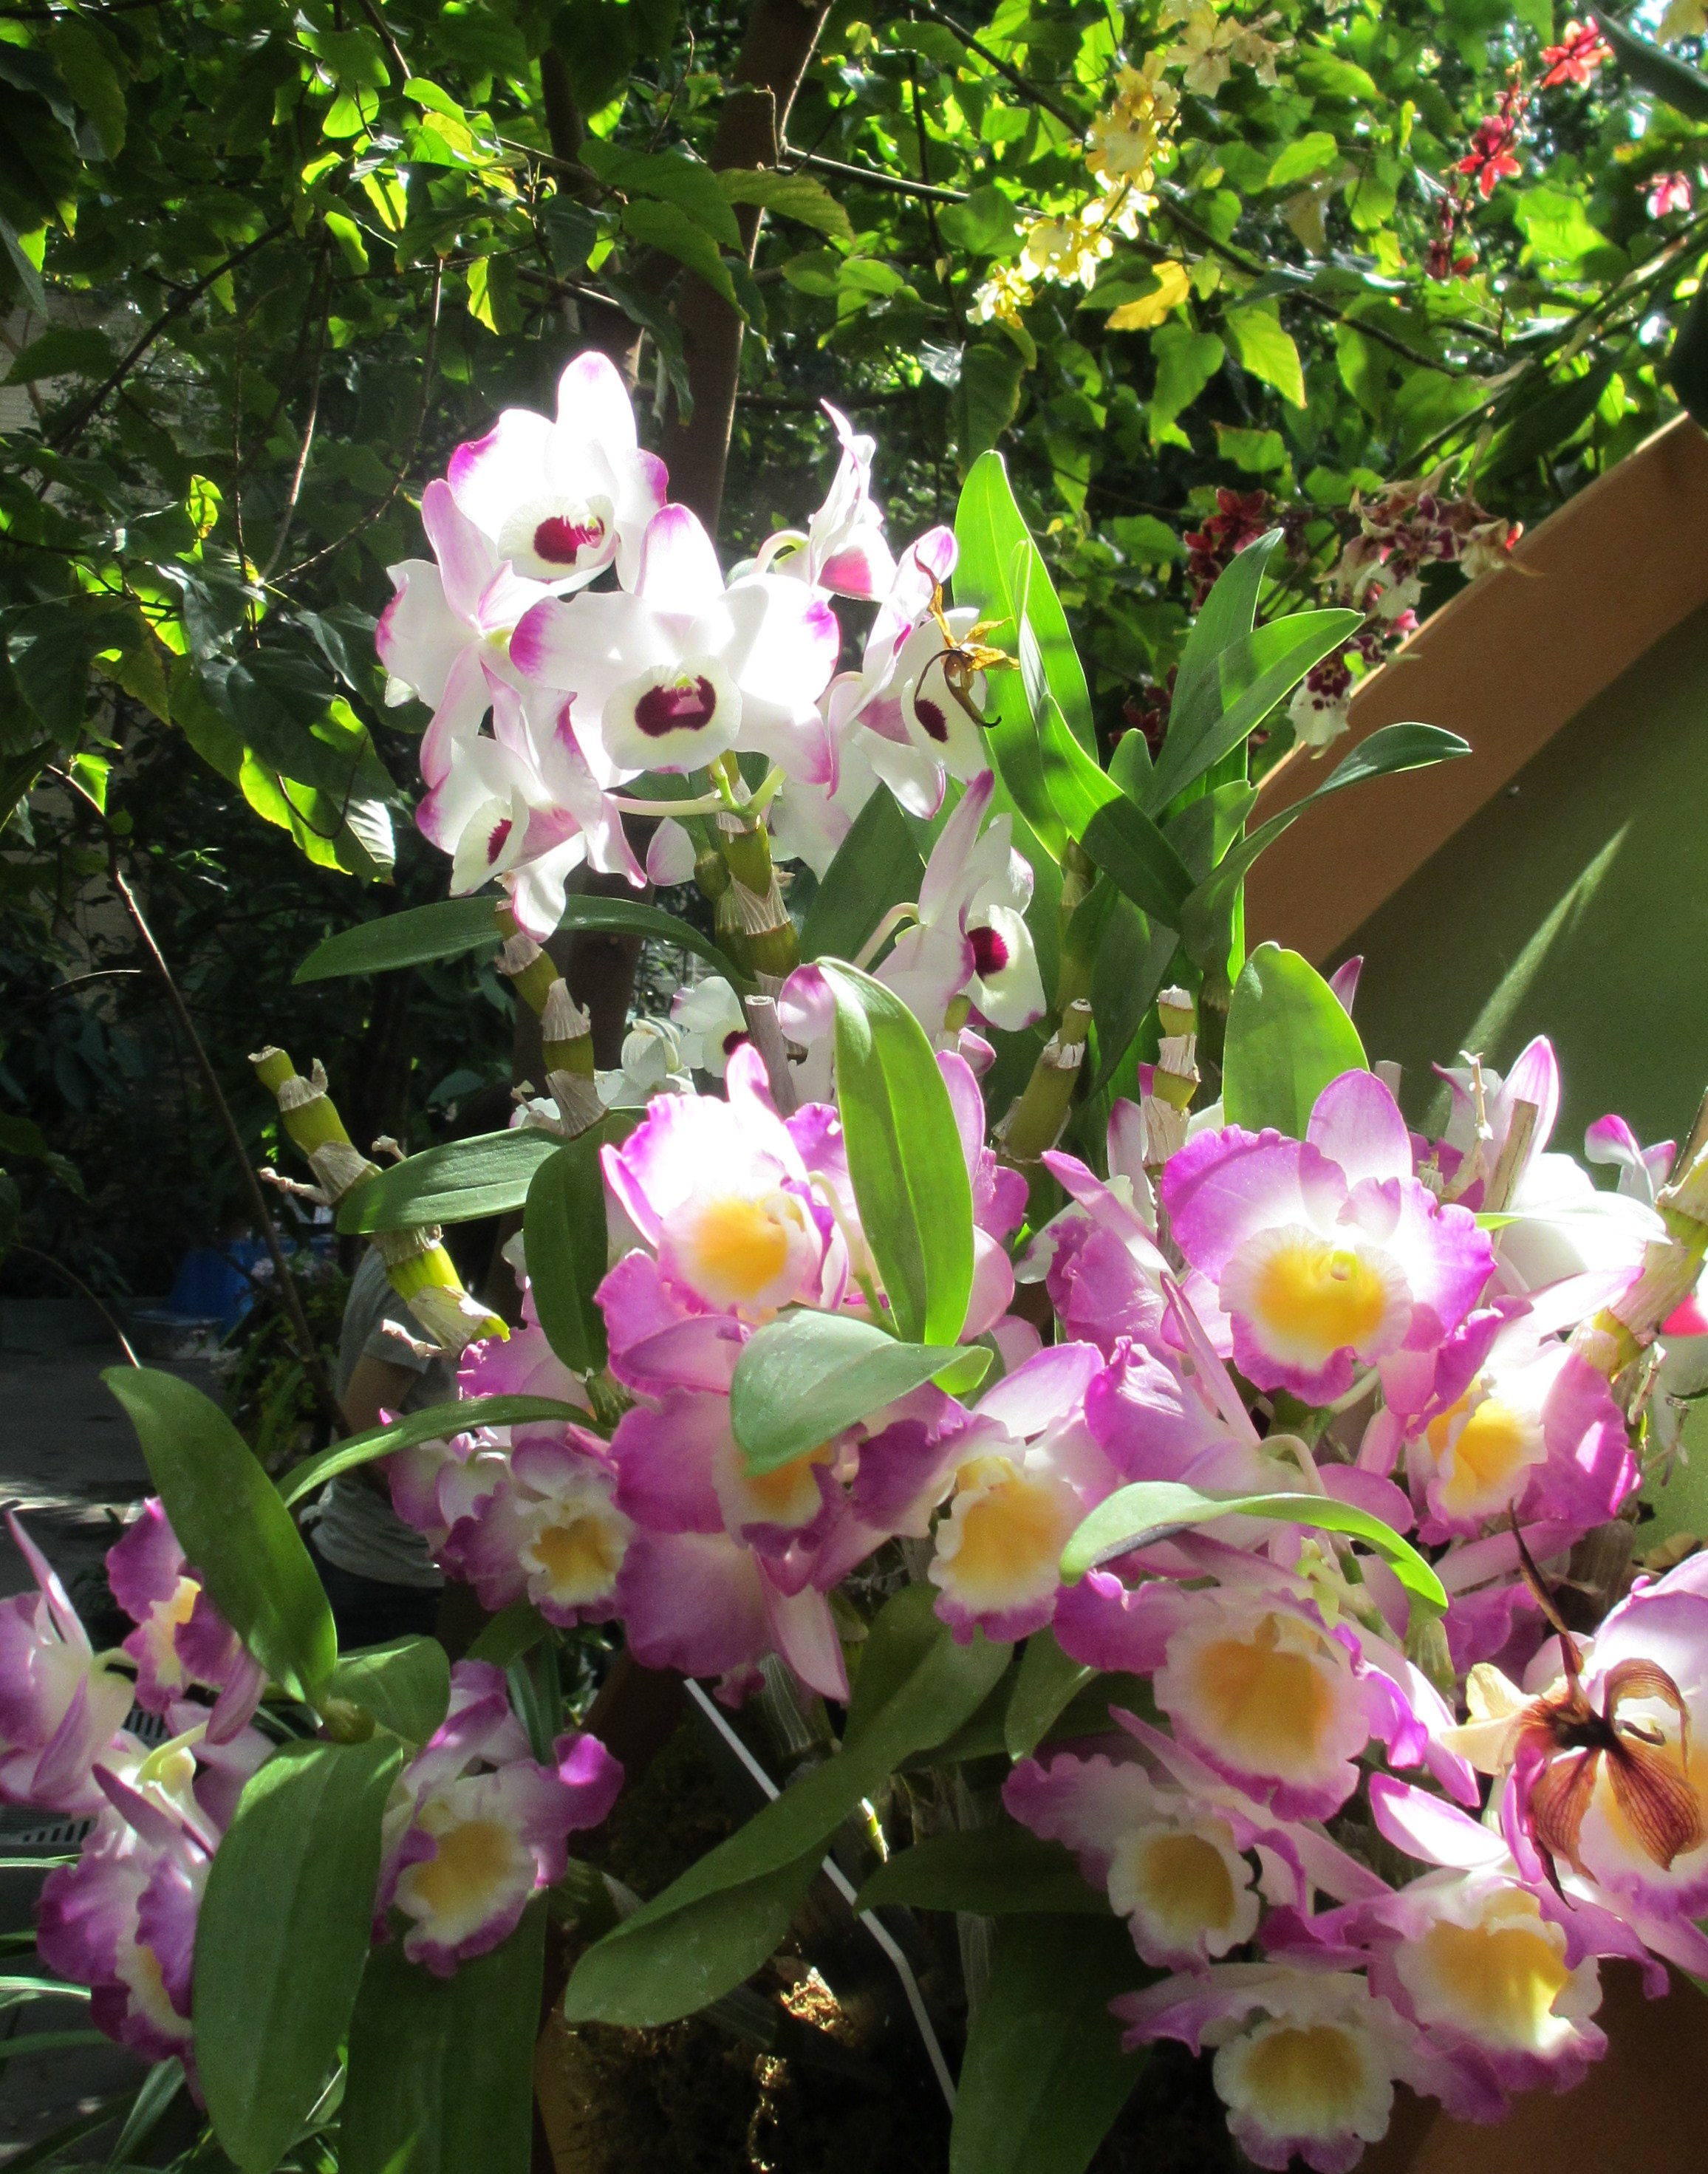 Oncidium Sphacelatum 1557 as well Vanda Tessellata 2574 besides Grammatophyllum Scriptum Var Citrinum 157 besides Mango Pickering Mangifera Indica Hybrid together with Ornamental Oregano Kent Beauty Origanum Rotundifolium. on books on growing orchids